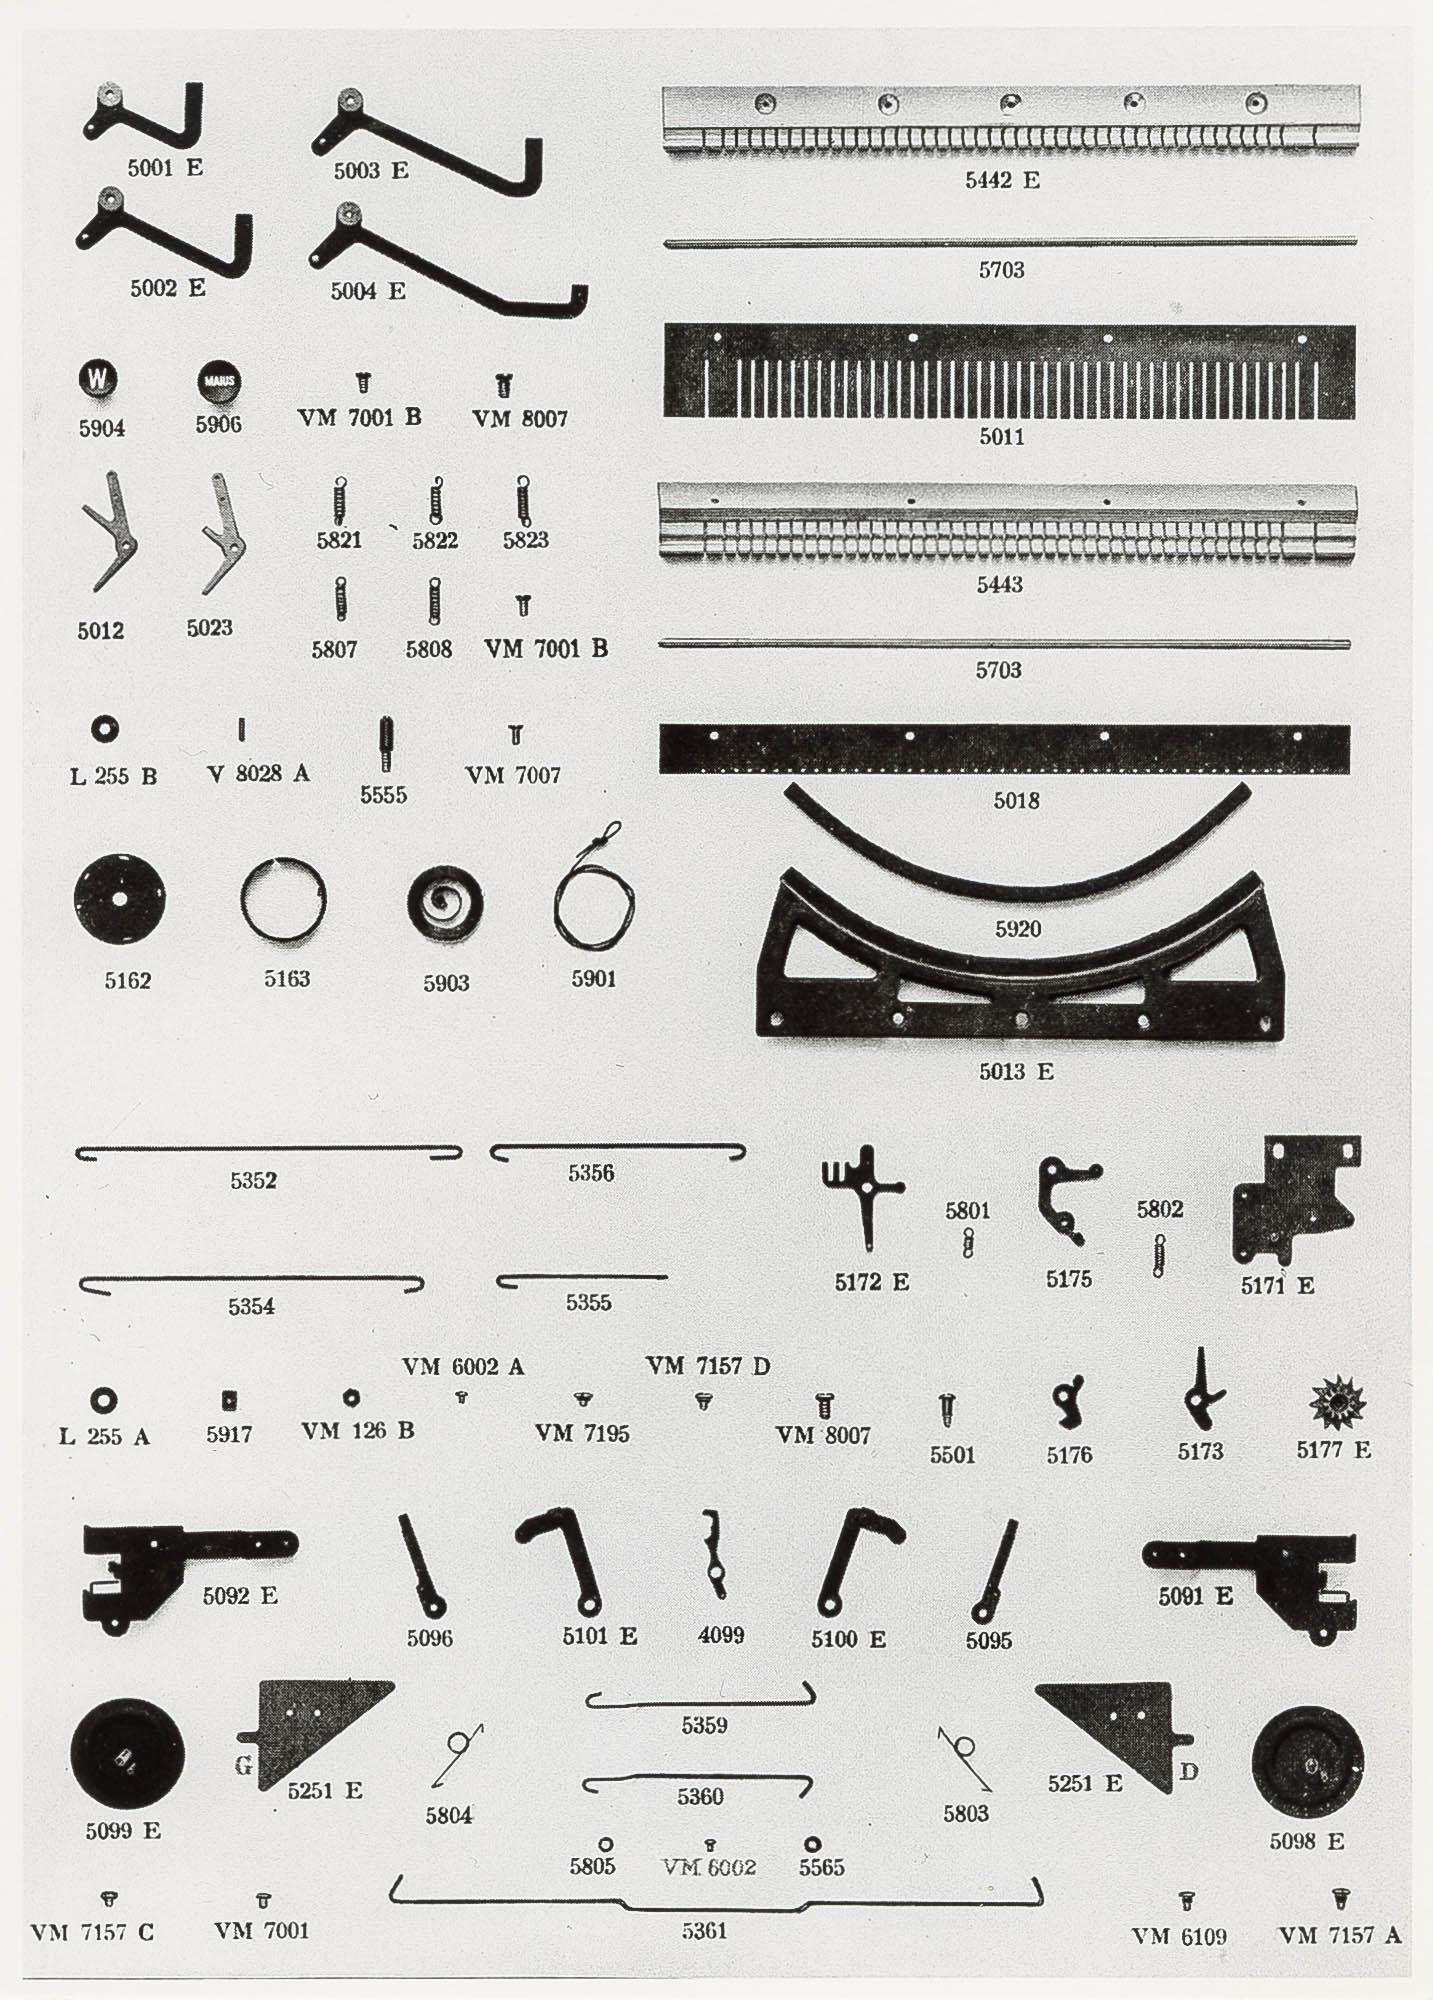 Hermes Baby Giuseppe Prezioso Schreibmaschine